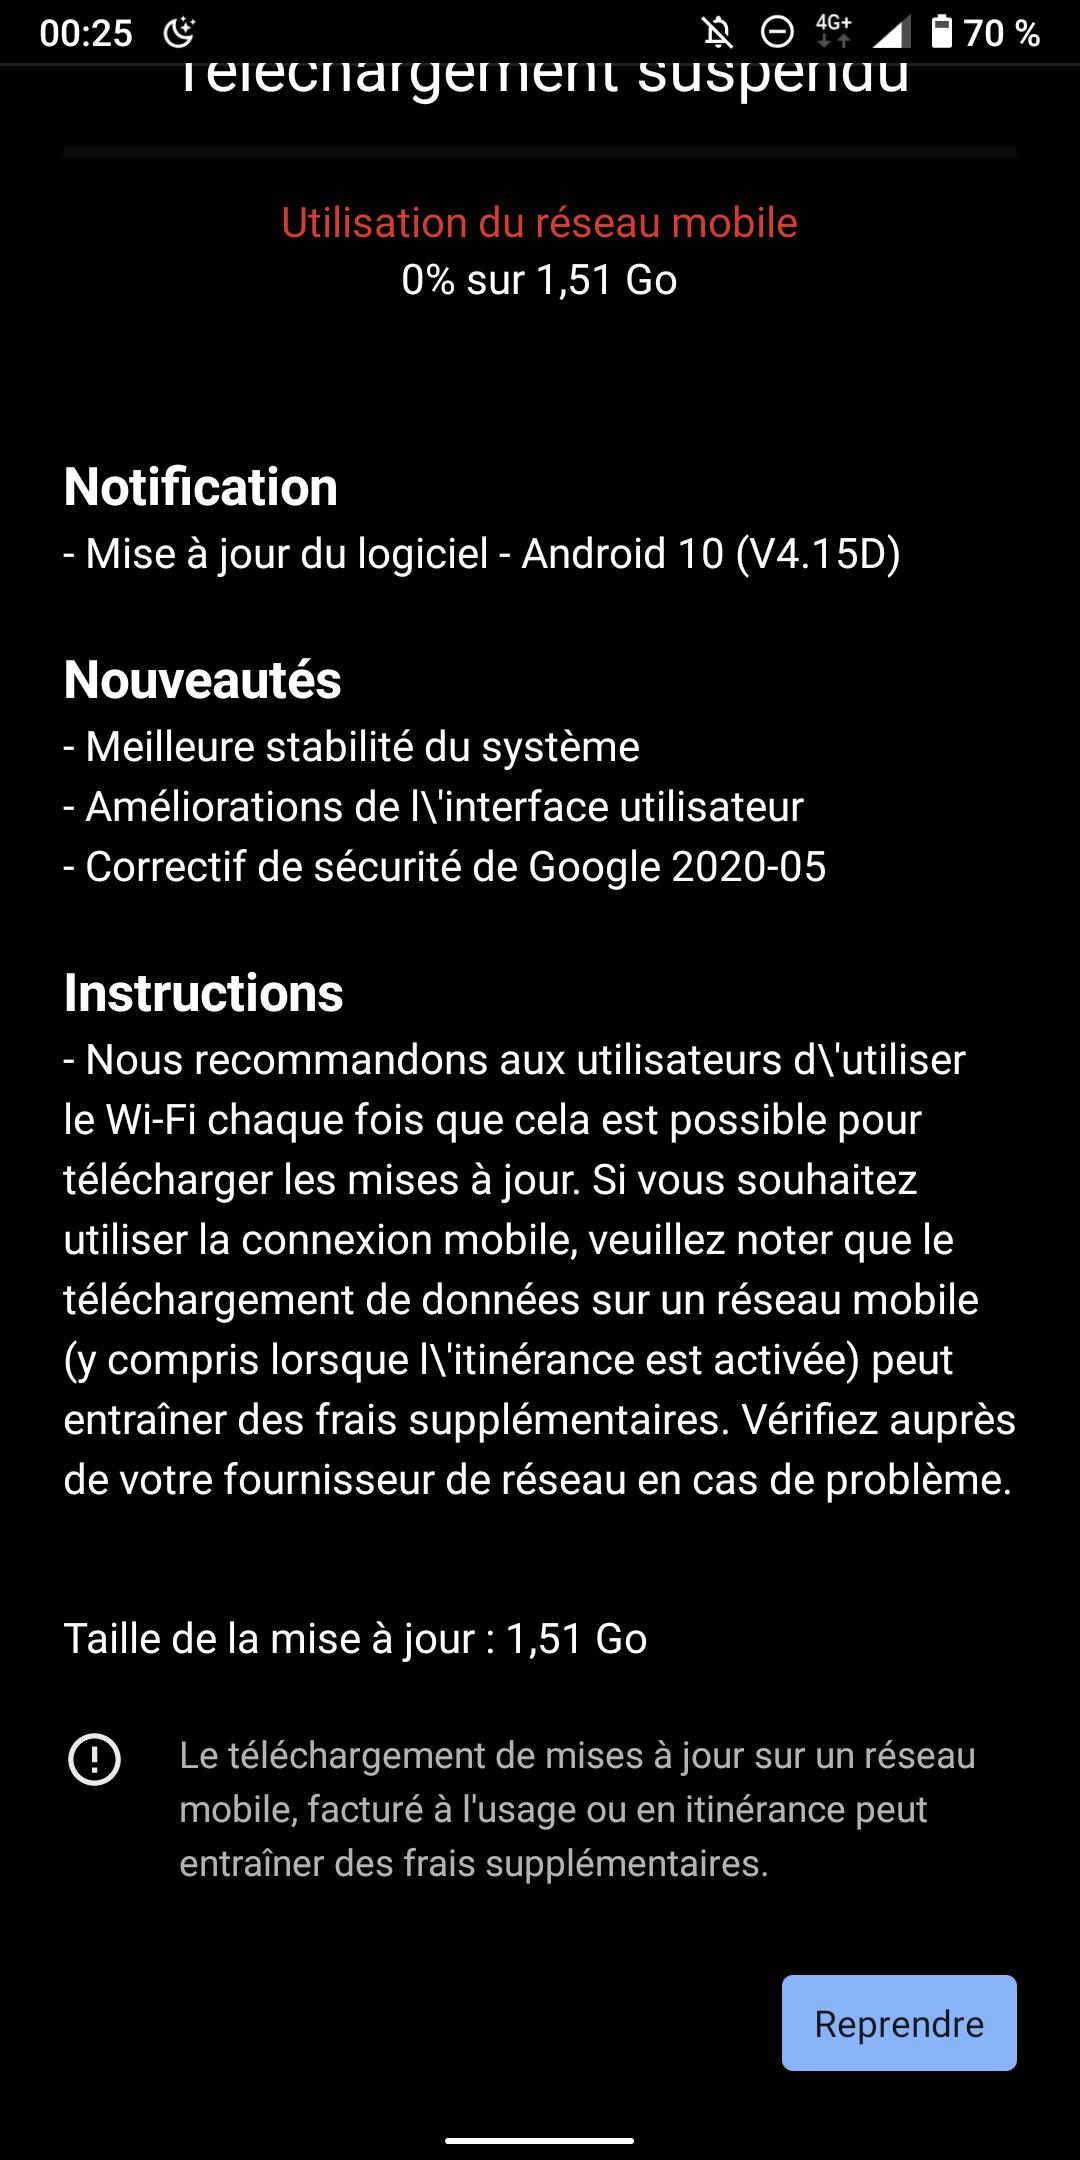 Screenshot_20200527-002548.png